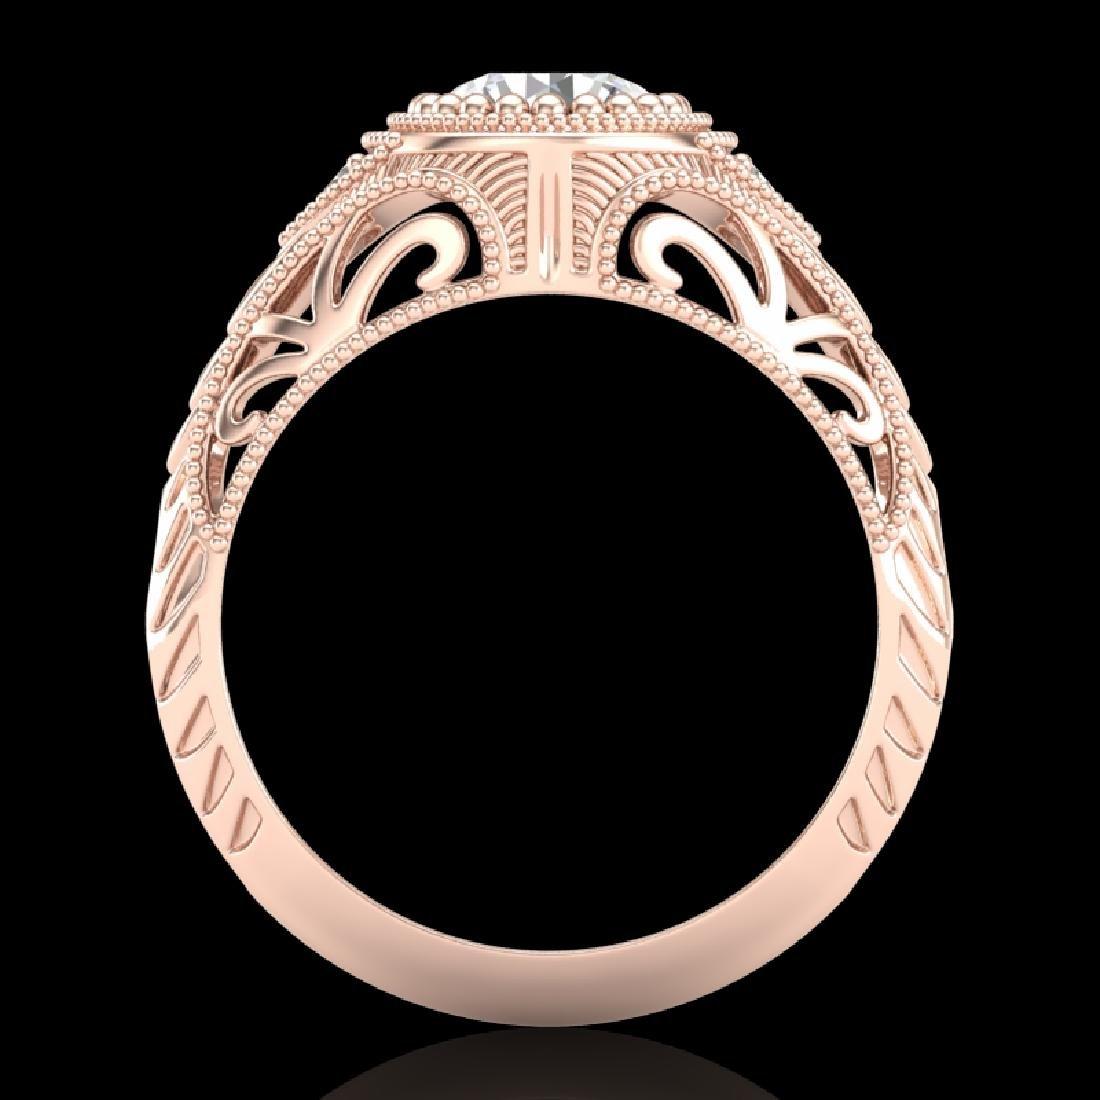 1.07 CTW VS/SI Diamond Solitaire Art Deco Ring 18K Rose - 2